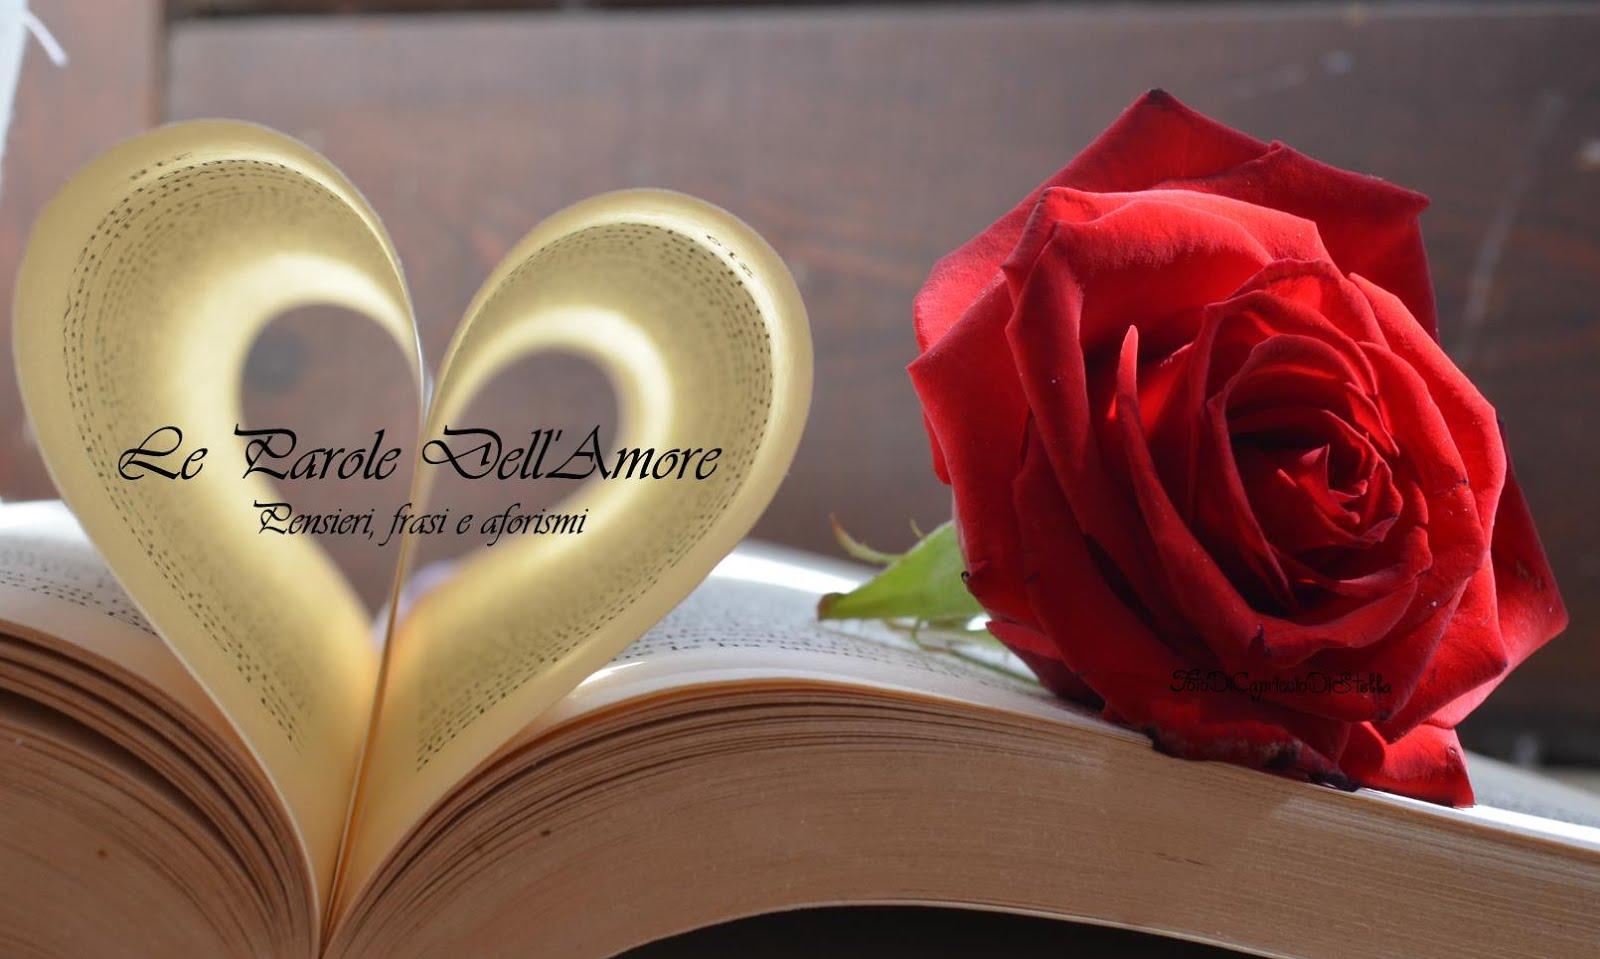 Le Parole dell'Amore - Pensieri, frasi e aforismi